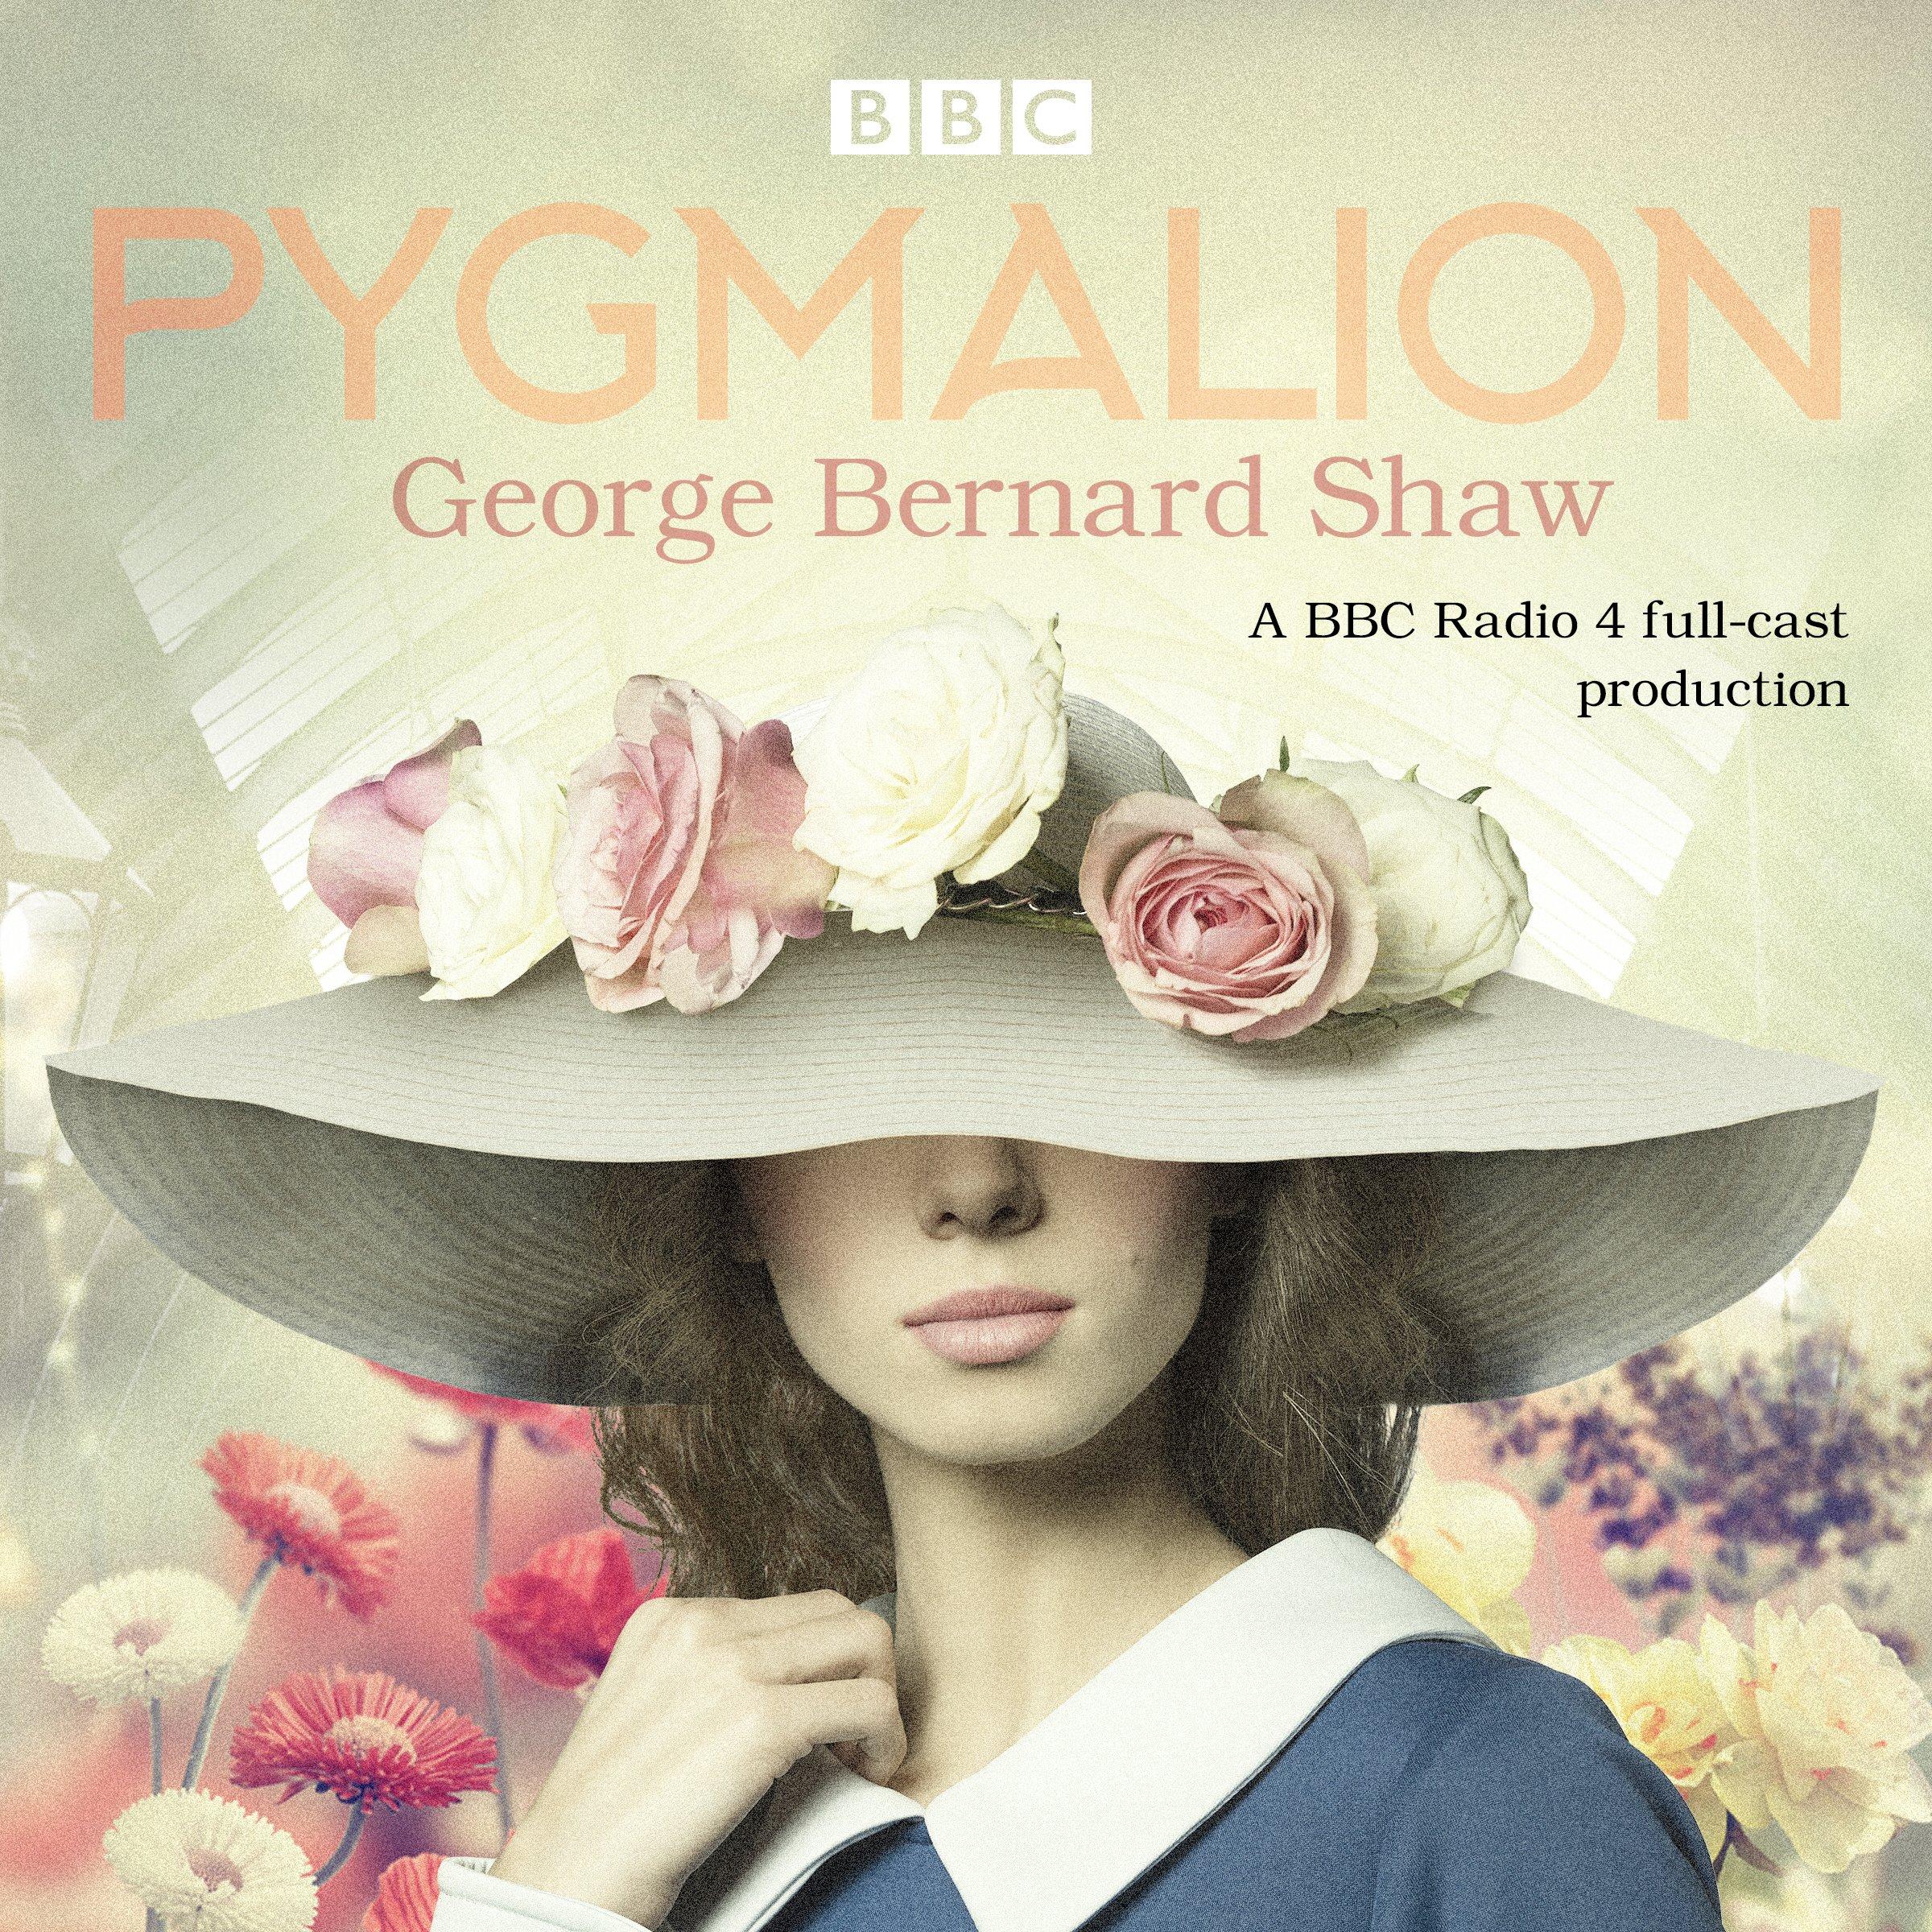 Pygmalion: A brand new BBC Radio 4 drama plus the story of